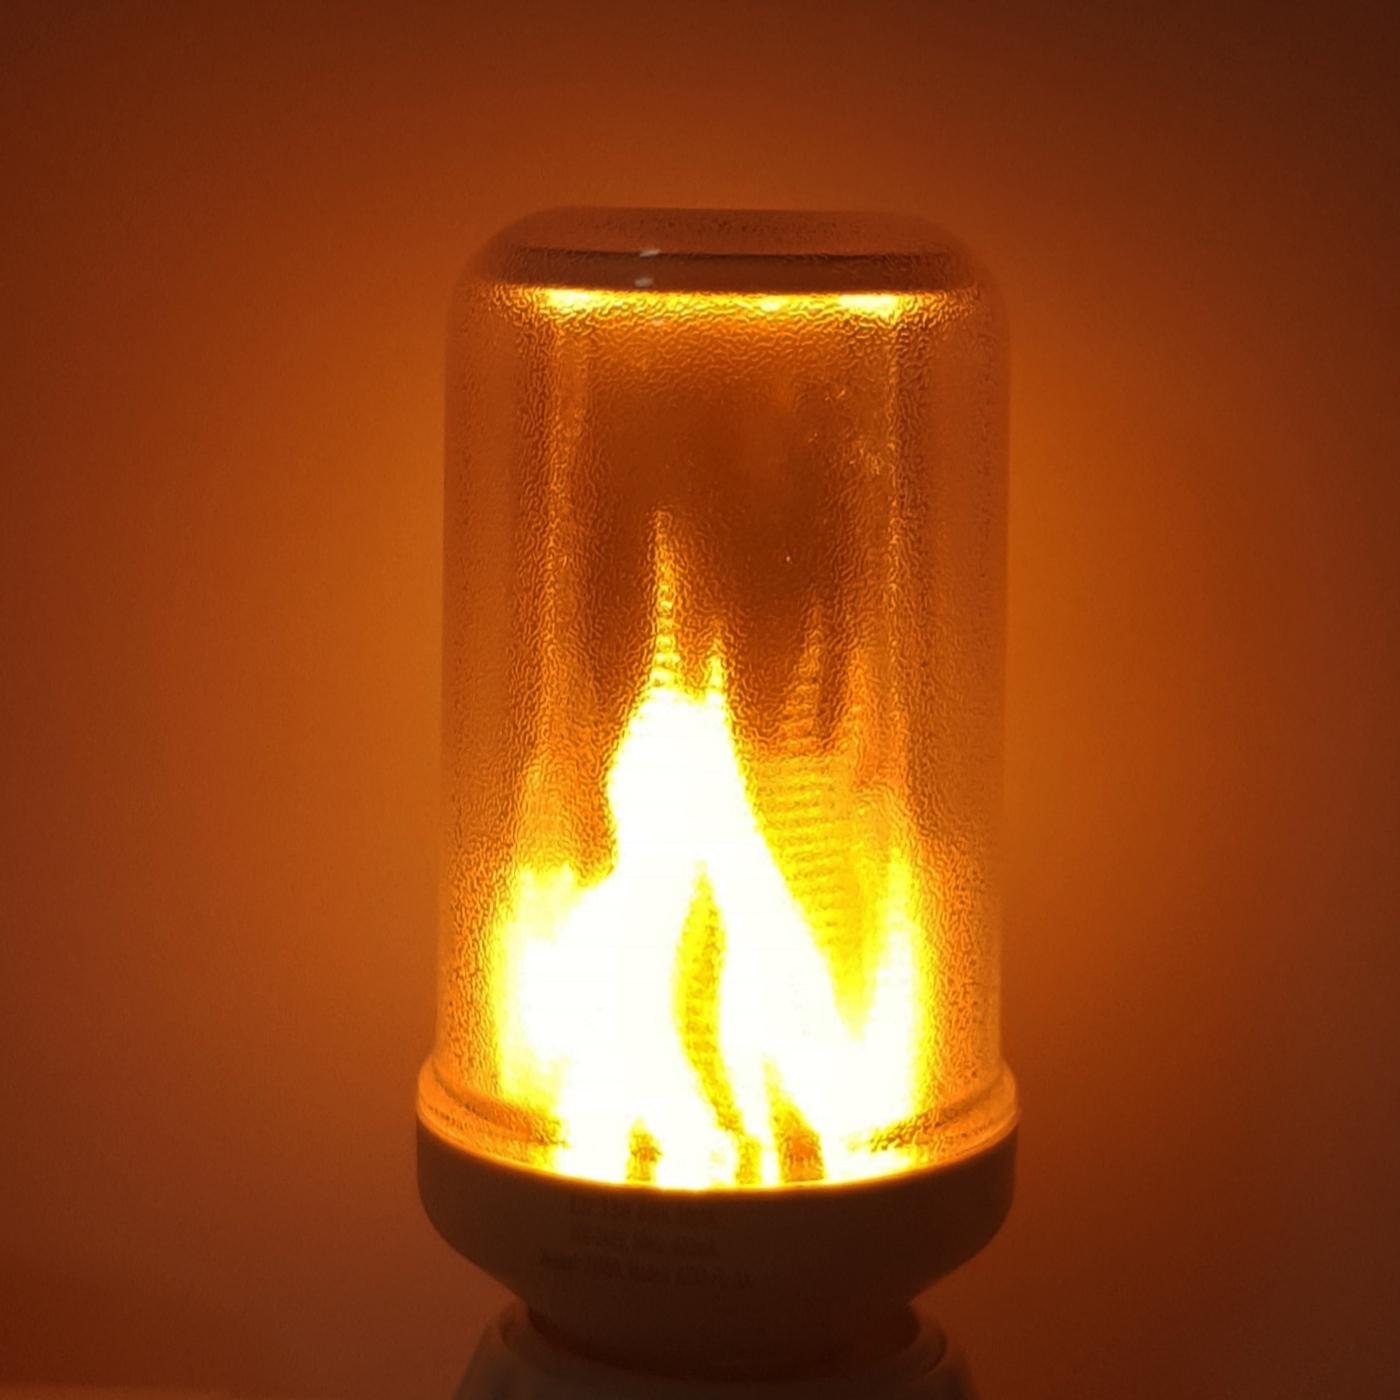 LED Flammlicht Fire-Flame-Lamp E27 230V 3W flackernd Flammen-Feuer-Effekt Fackel